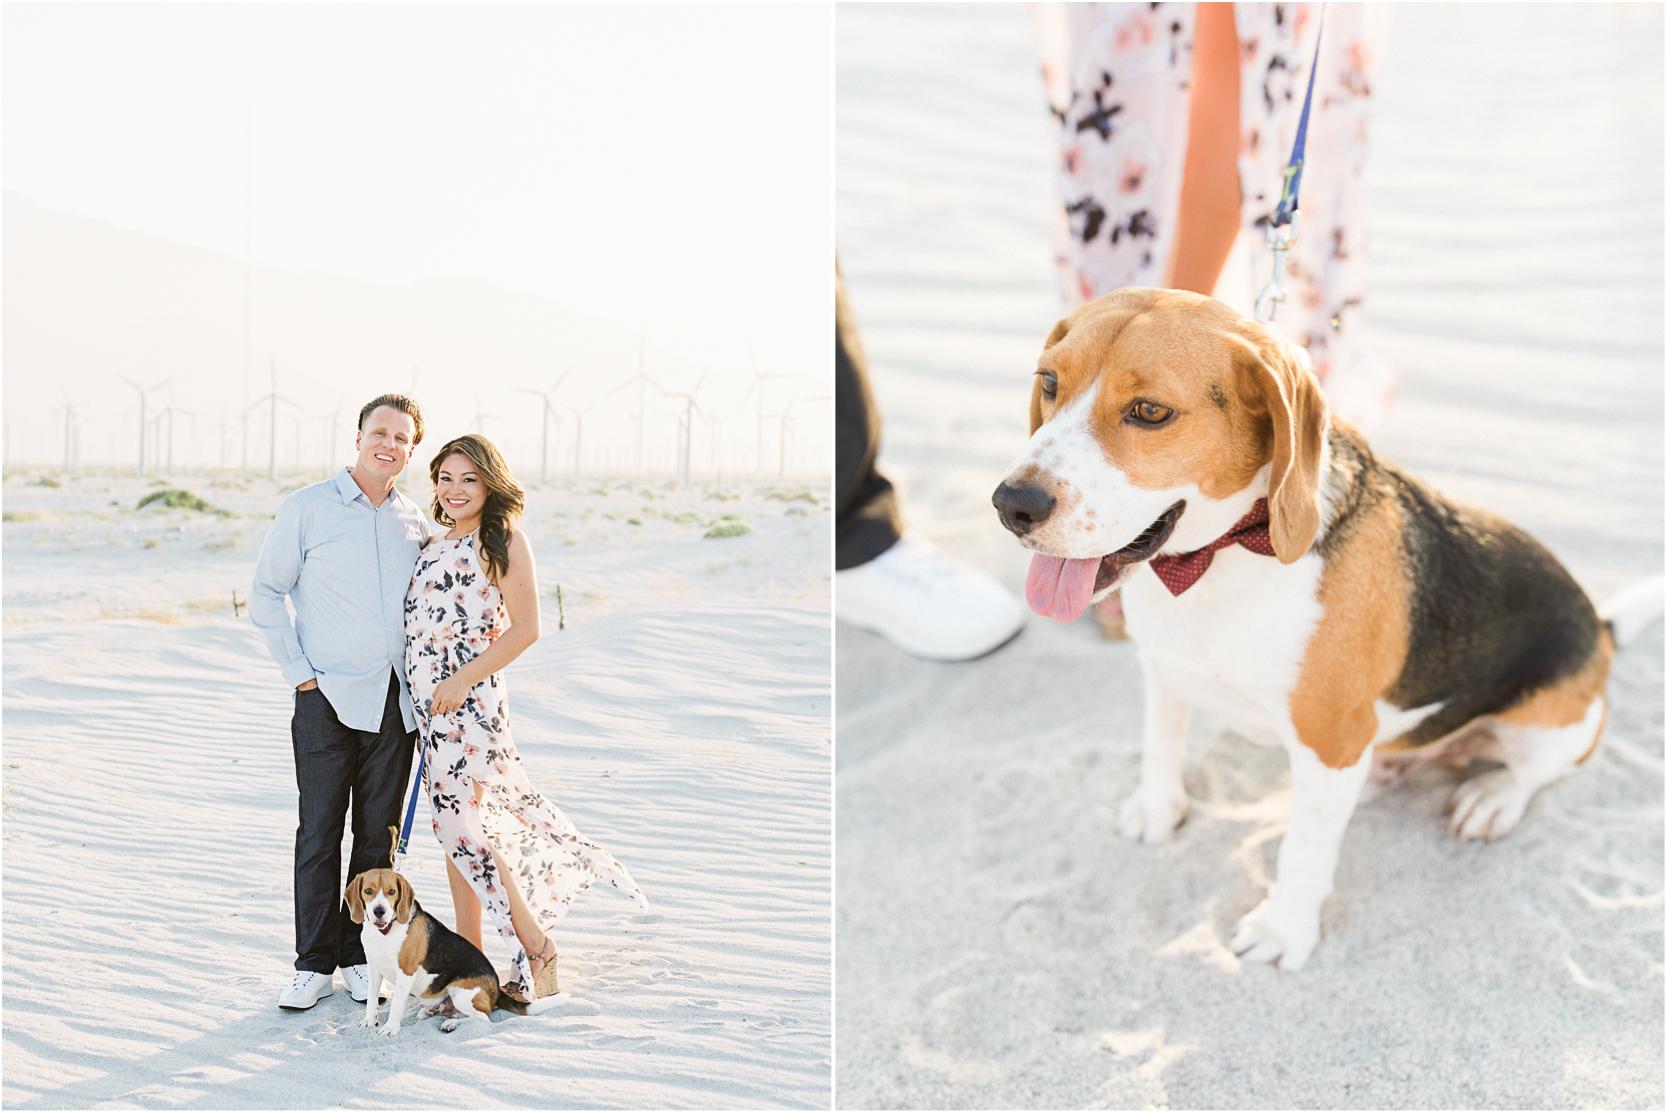 Alexis Ralston | Desert Engagement Session | Windfarm Session | Intimate Desert Inspiration | Palm Springs Engagement | Wedding Inspiration | What to Wear 070.jpg